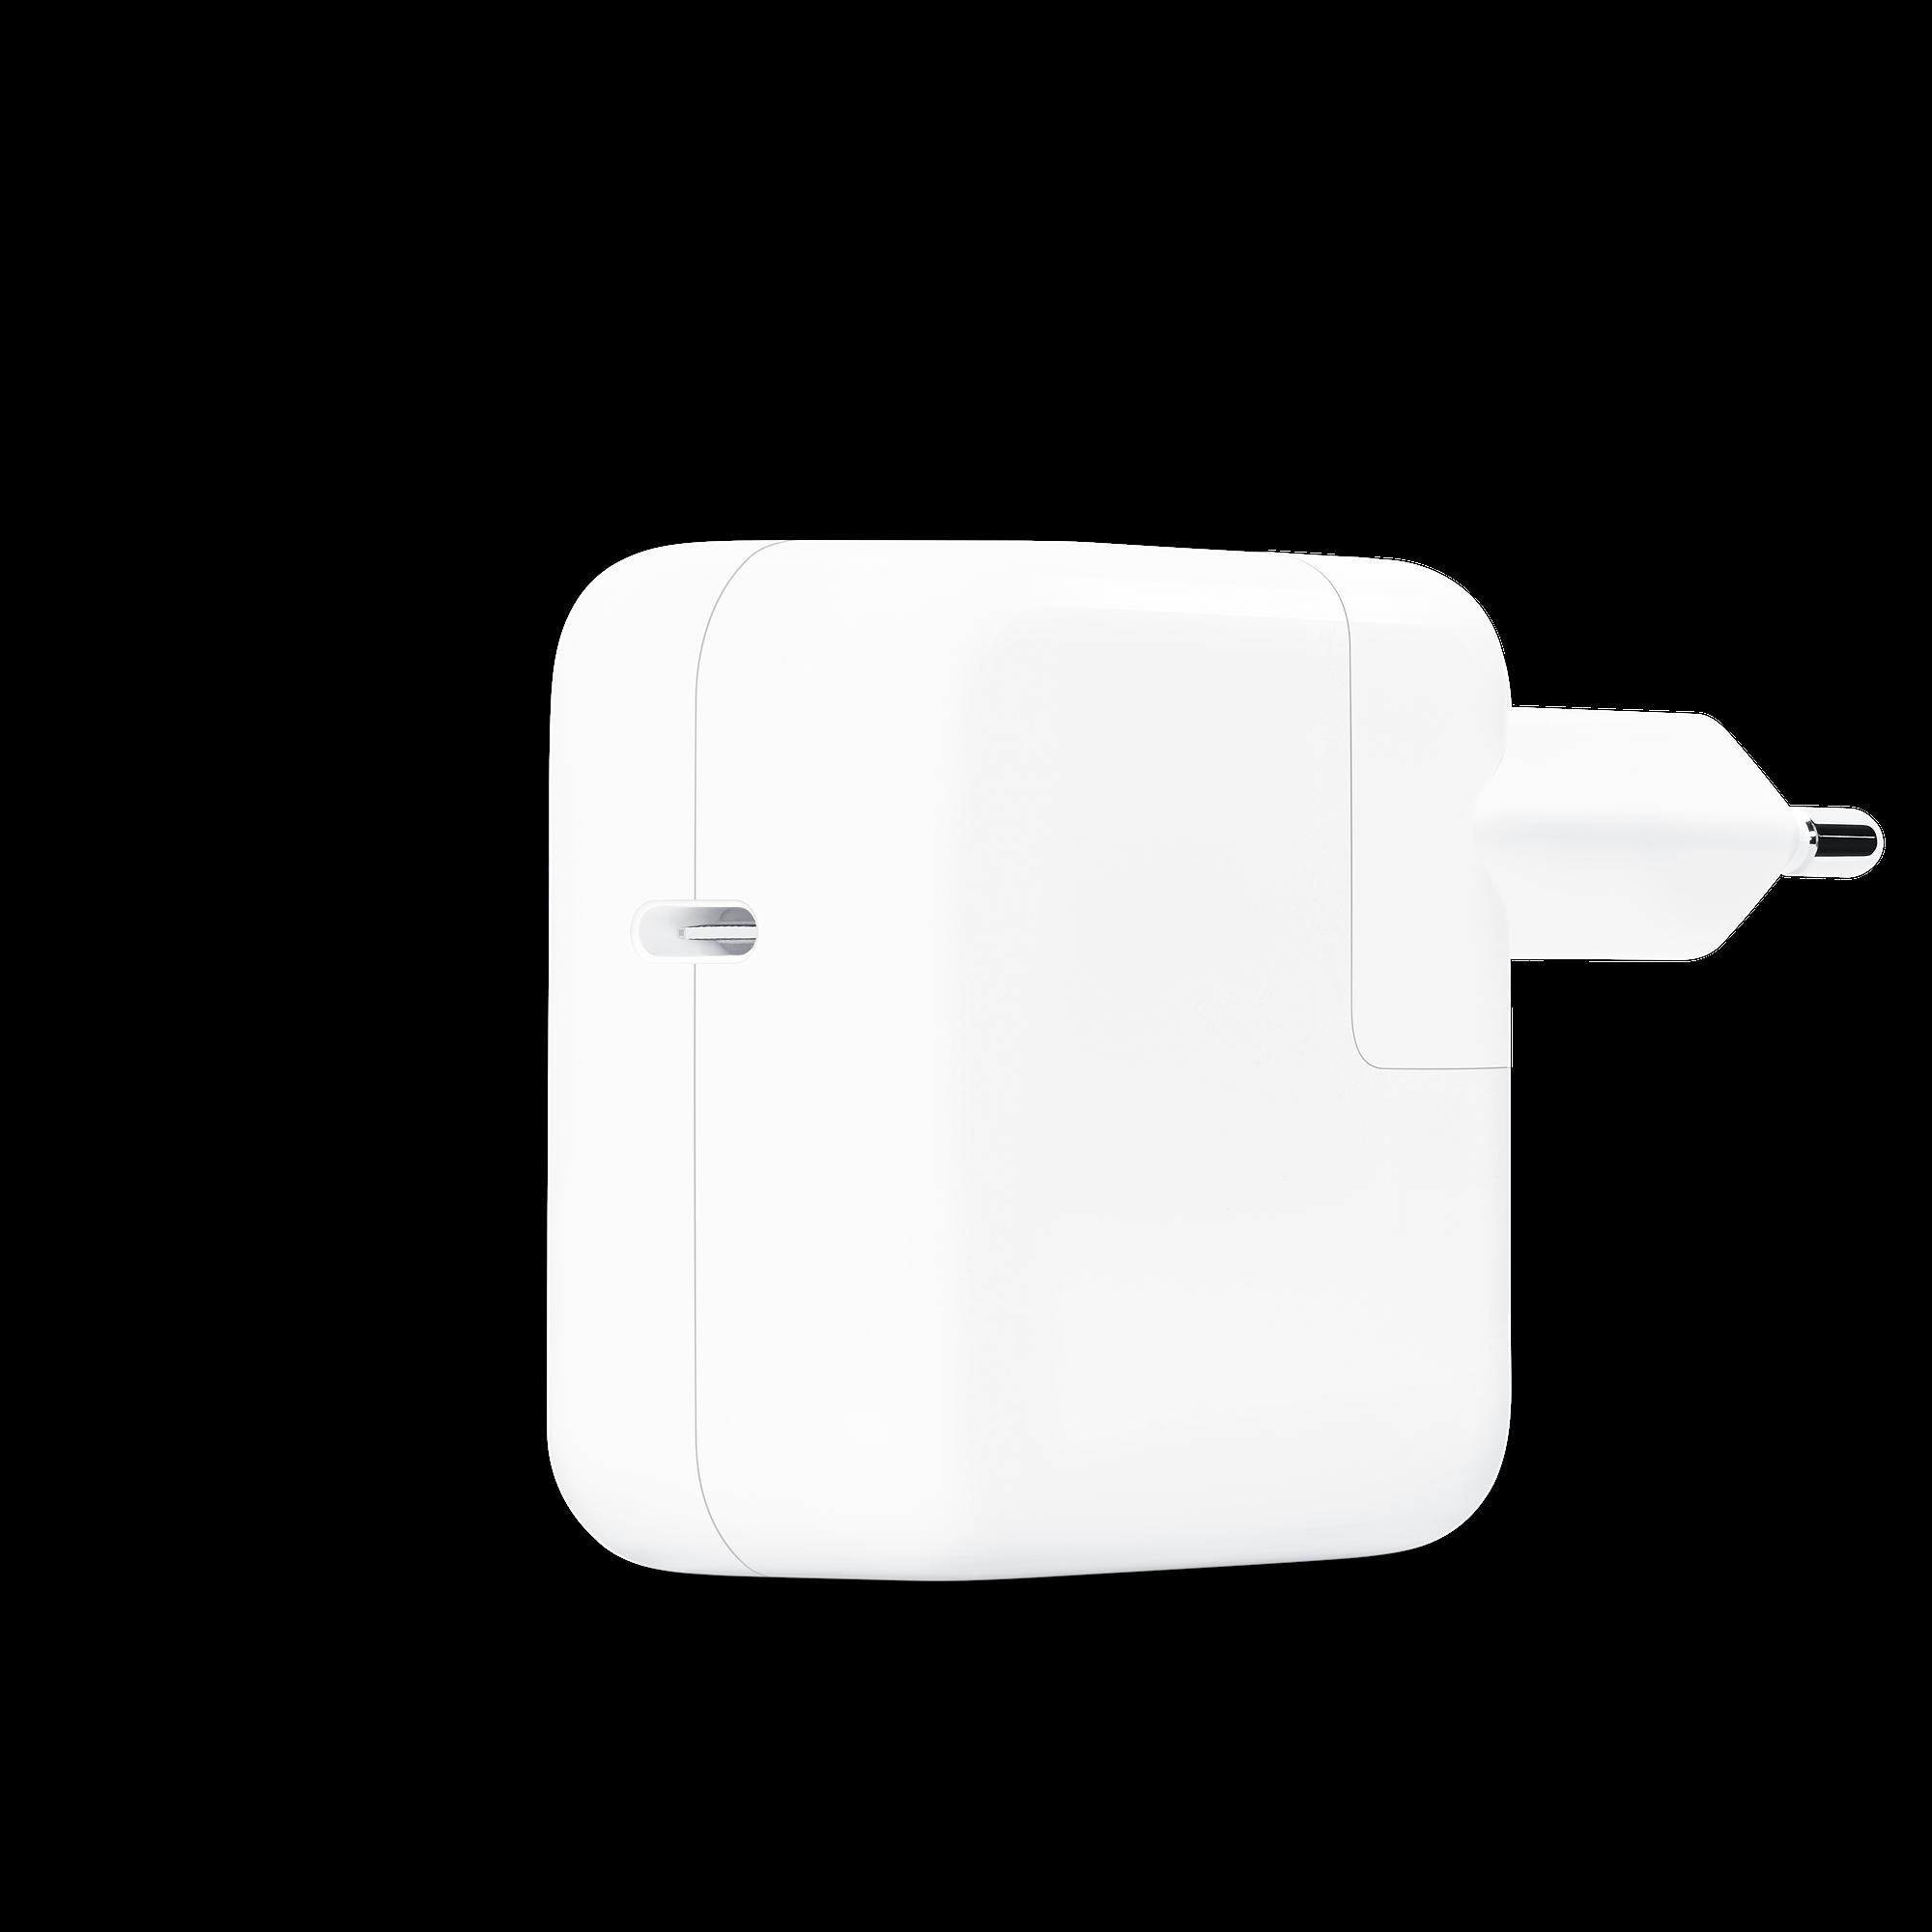 - Cargador 30 Watts USB-C 2